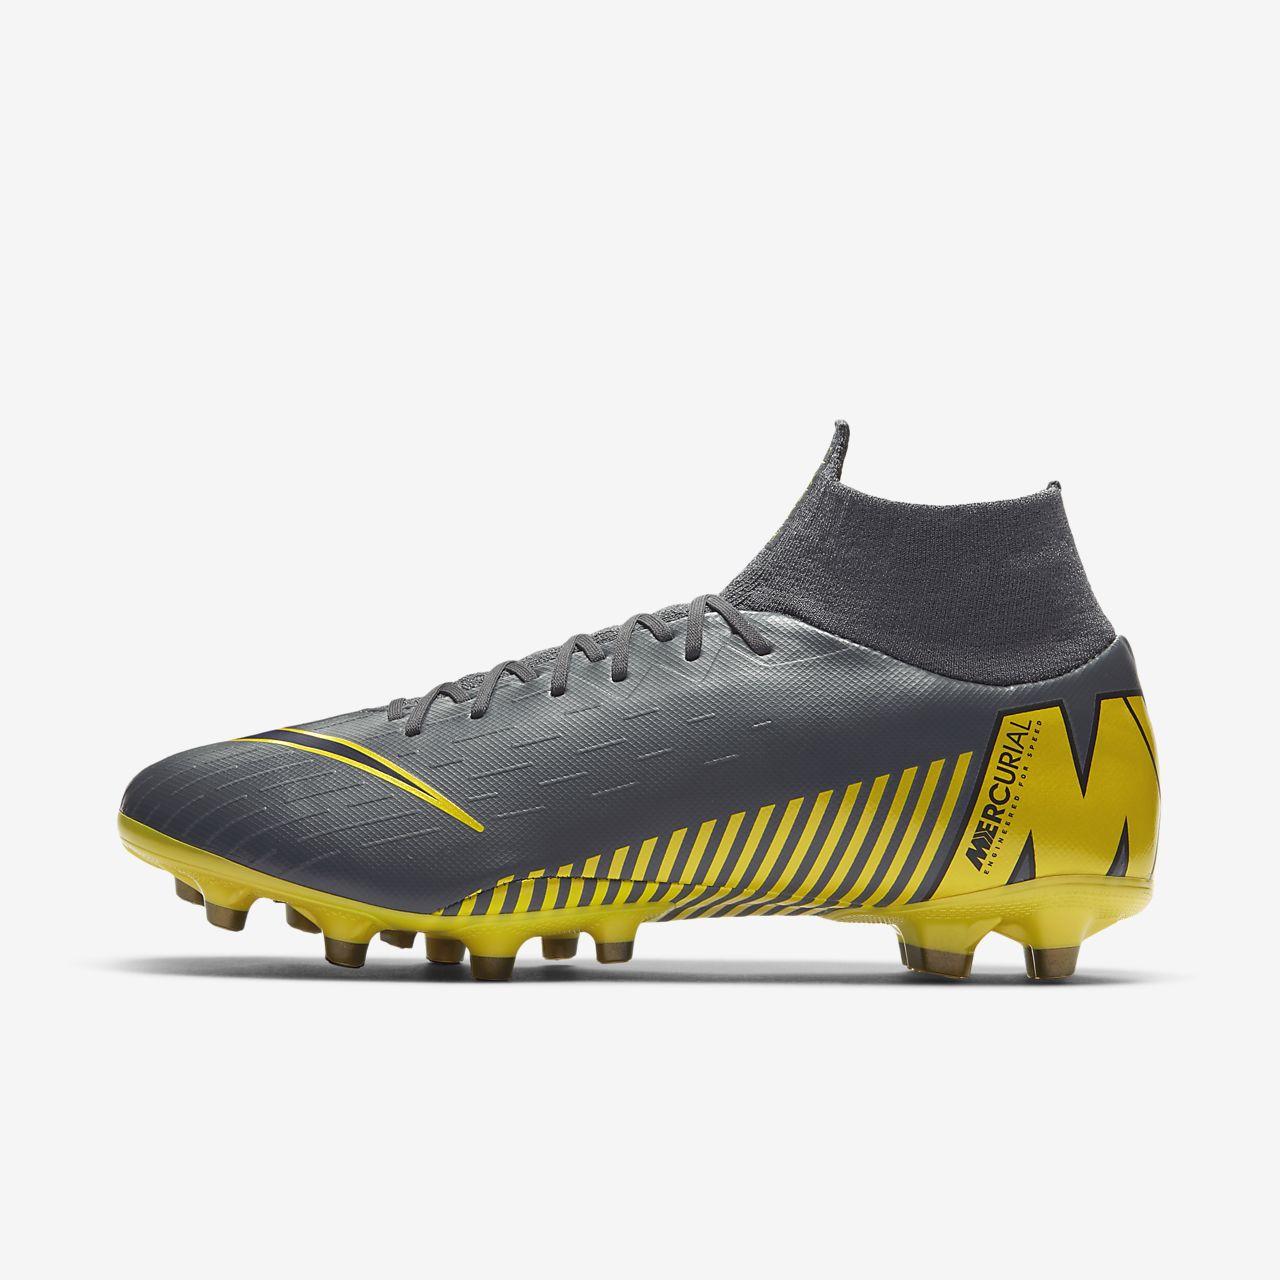 In Artificiale Erba Scarpa Per Campi Mercurial Nike Da Calcio xSwxqYn7IB